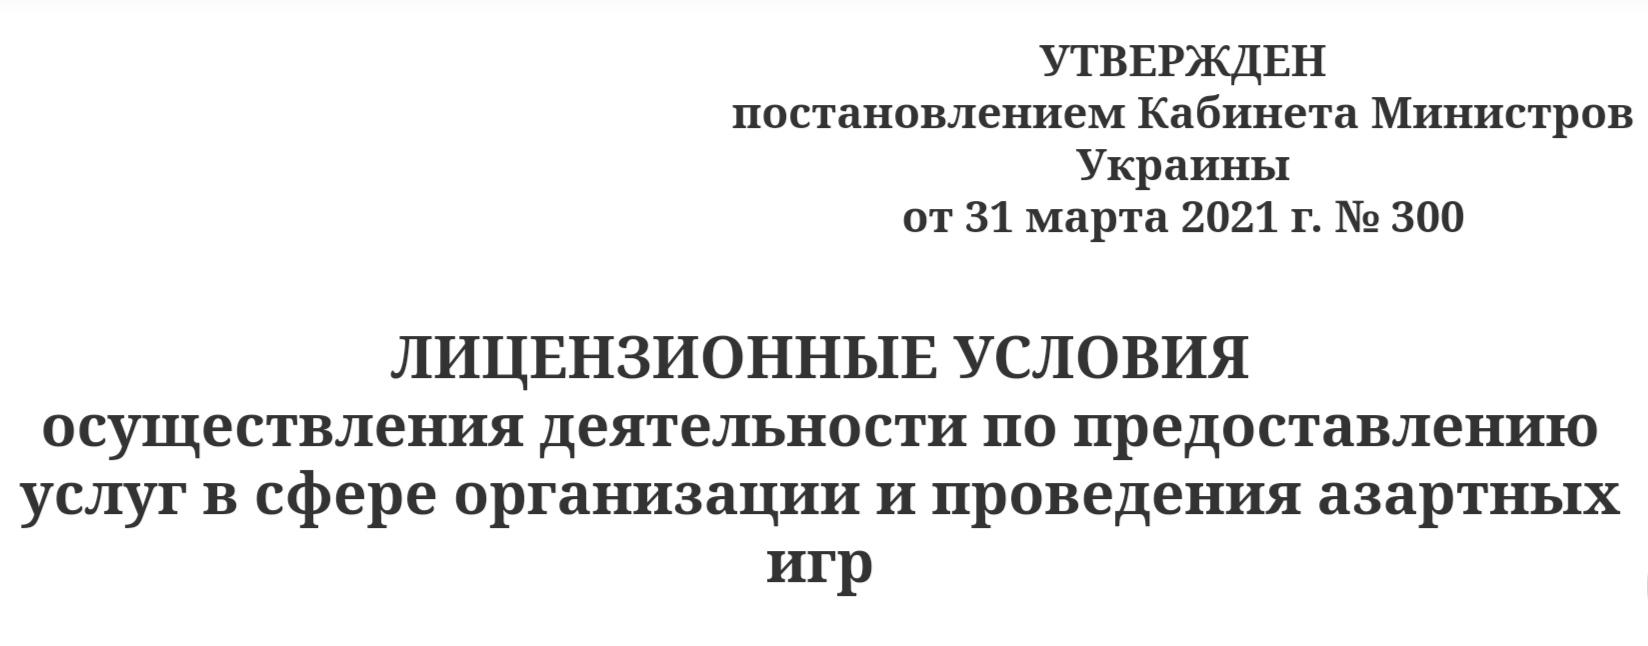 IMG_20210630_205354